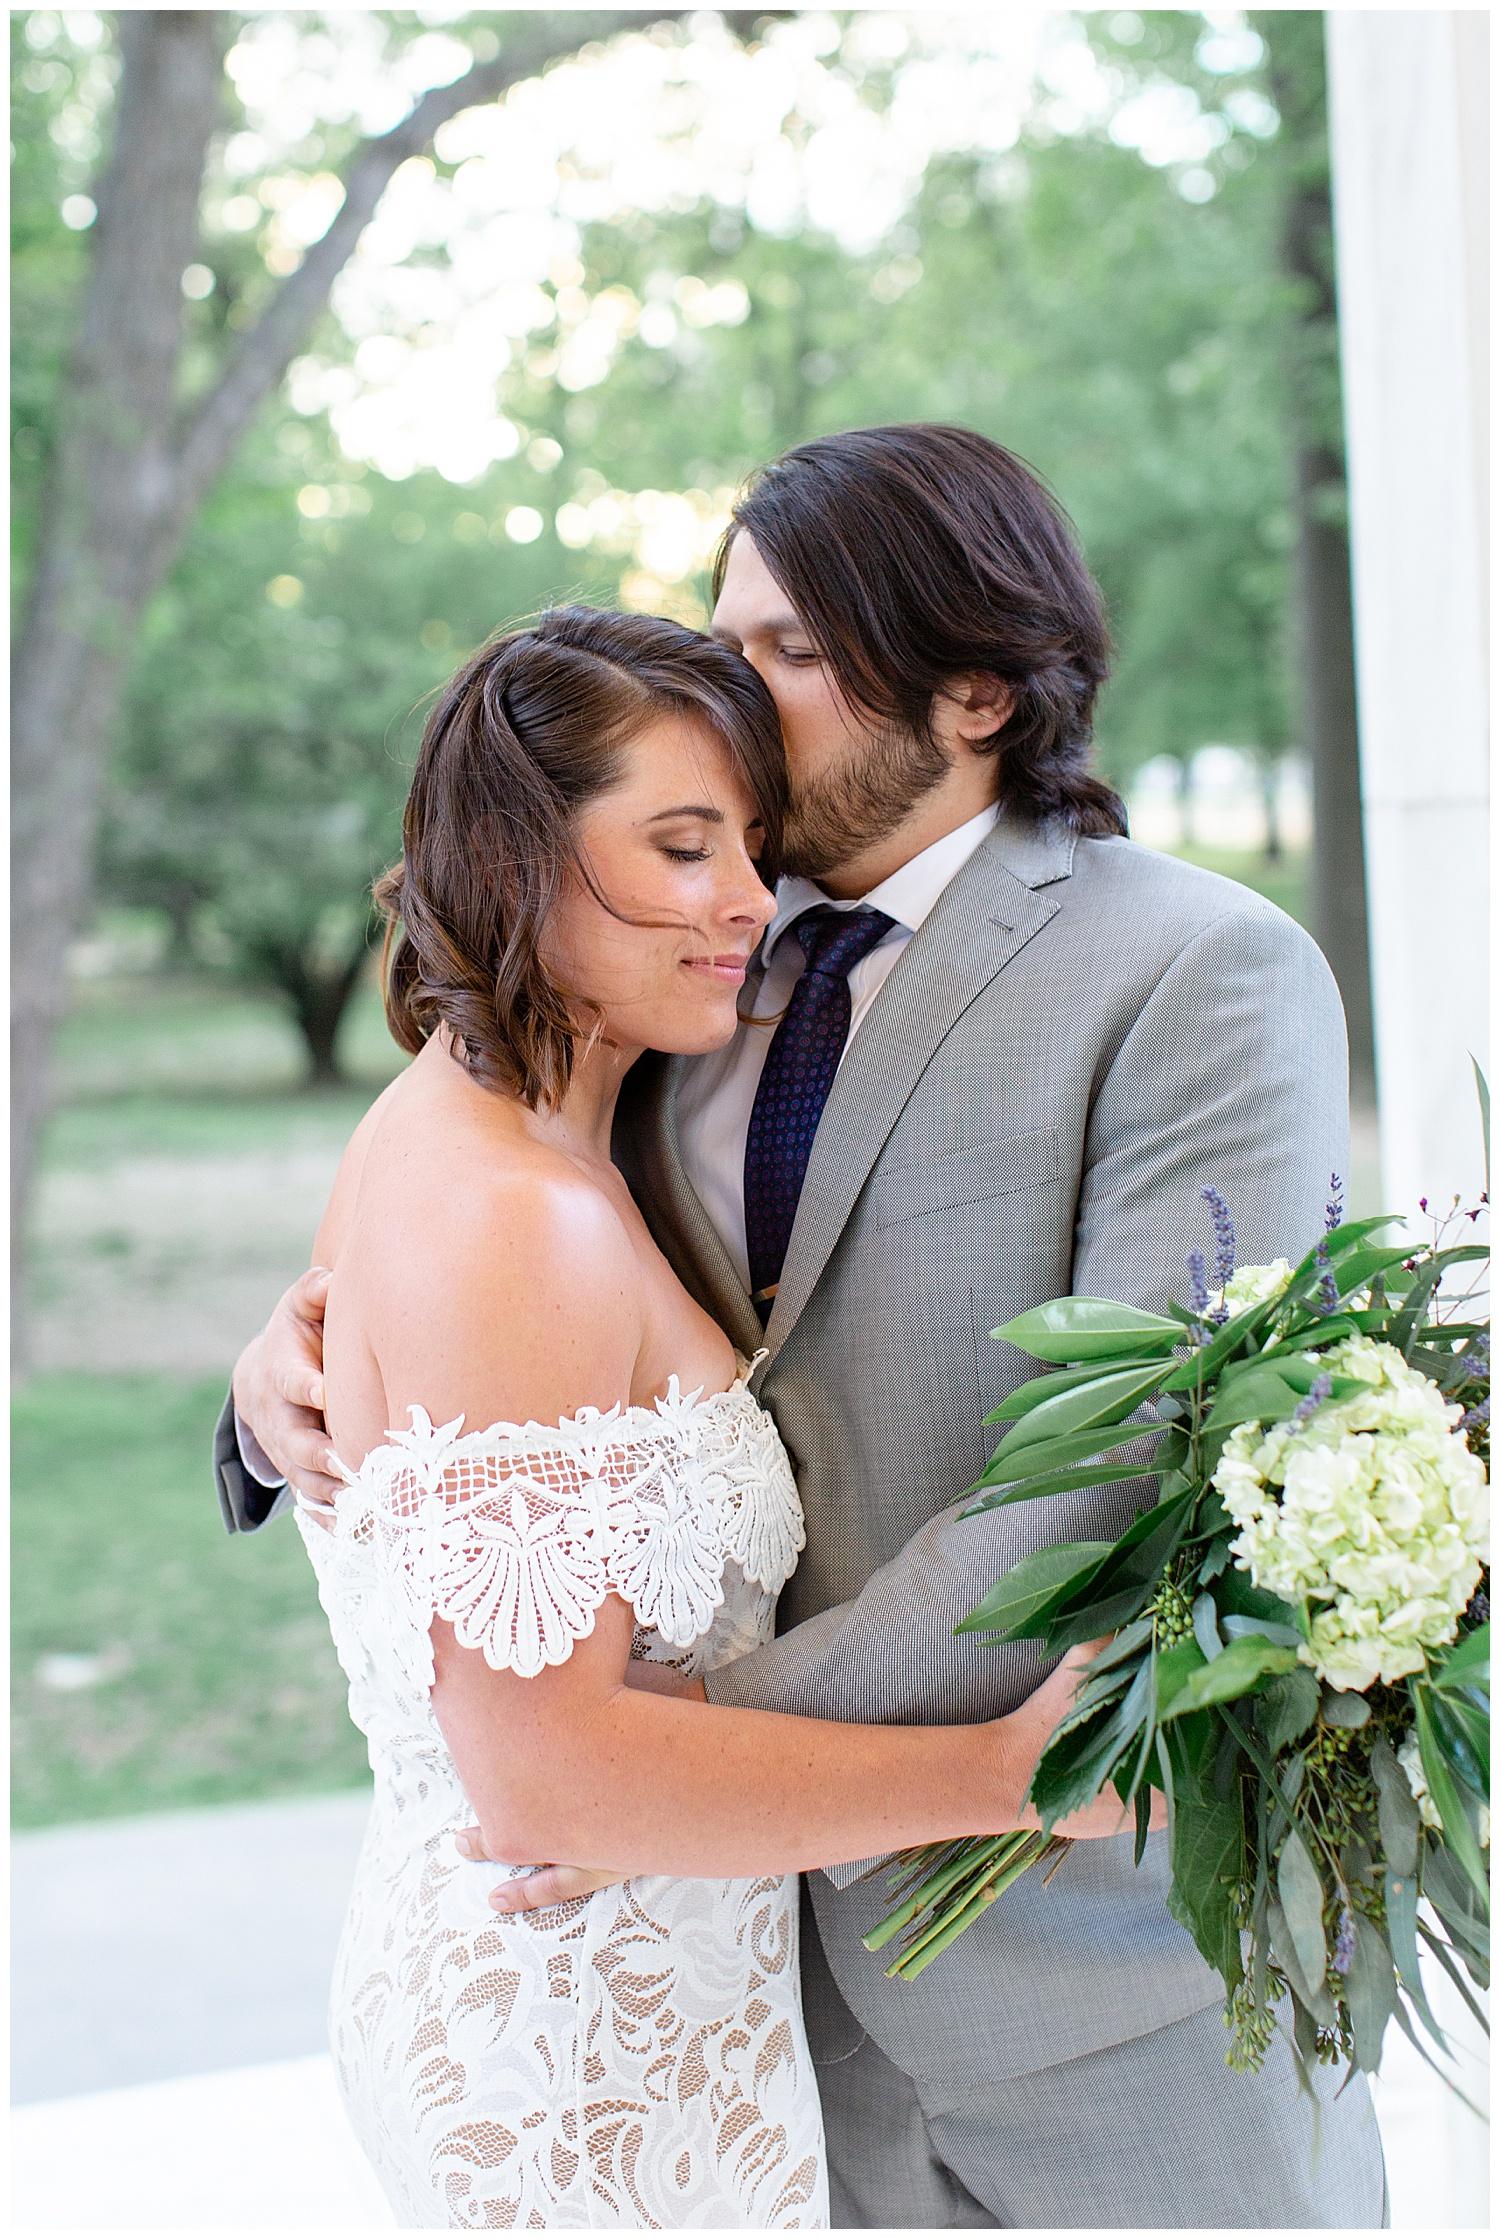 emily-belson-photography-washington-dc-wedding-41.jpg